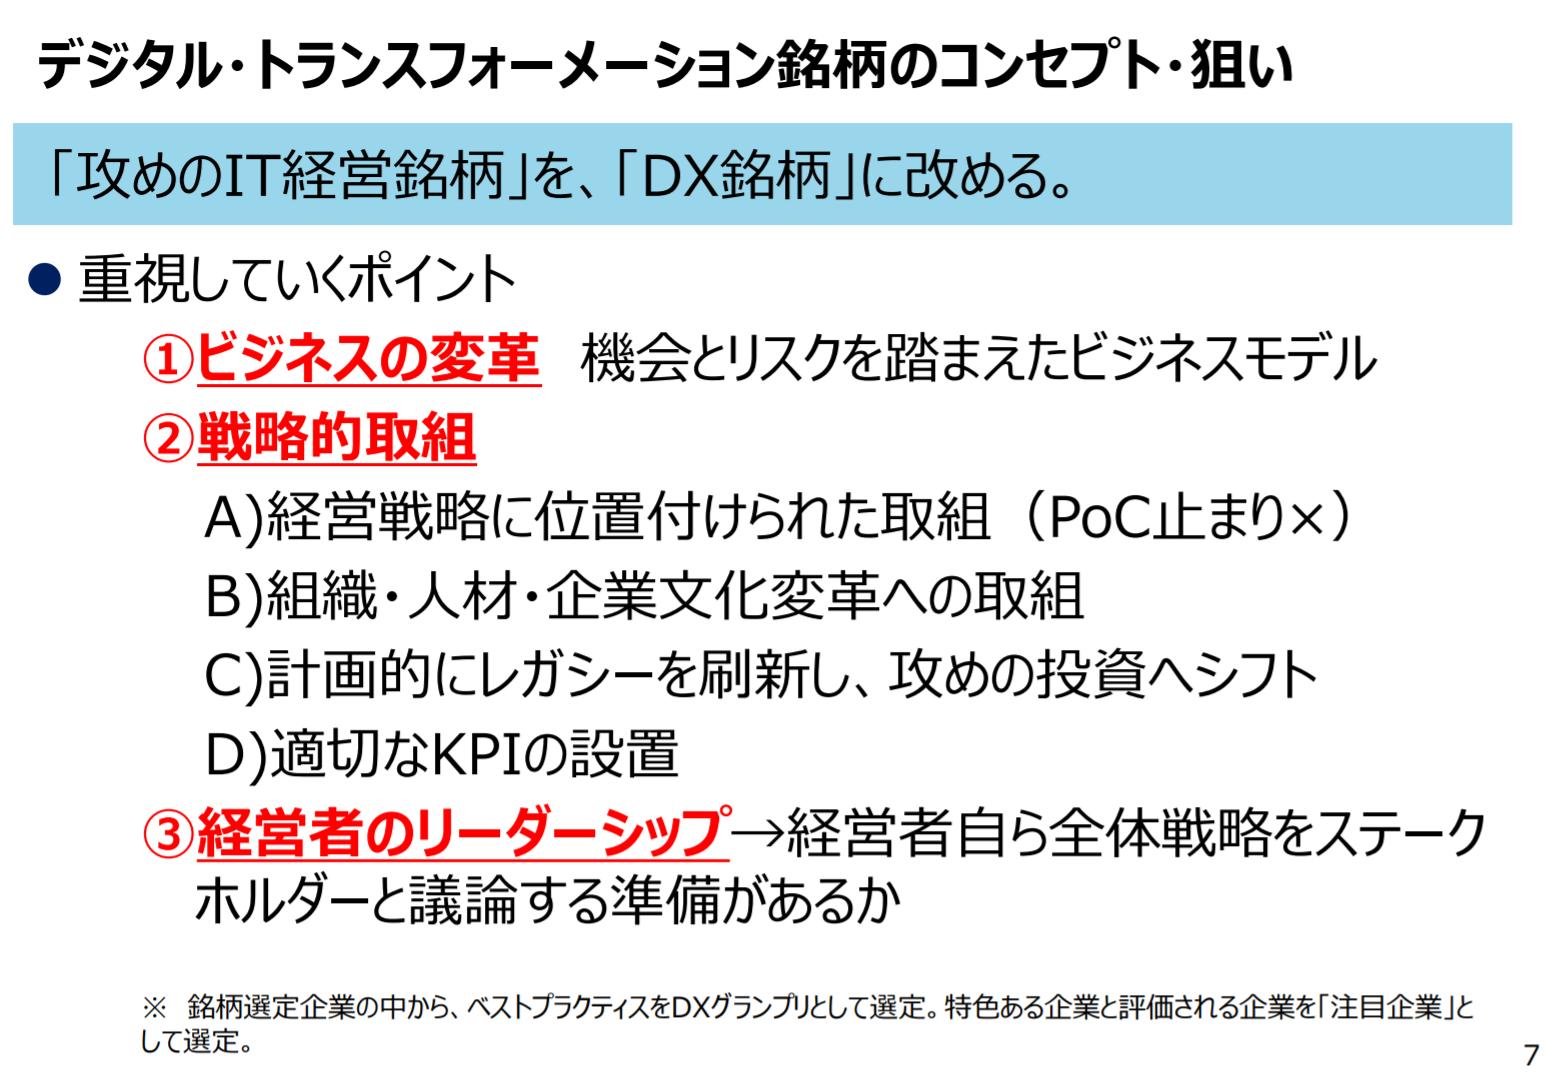 DXを巡る状況とデジタルトランスフォーメーション銘柄(DX銘柄)の狙い